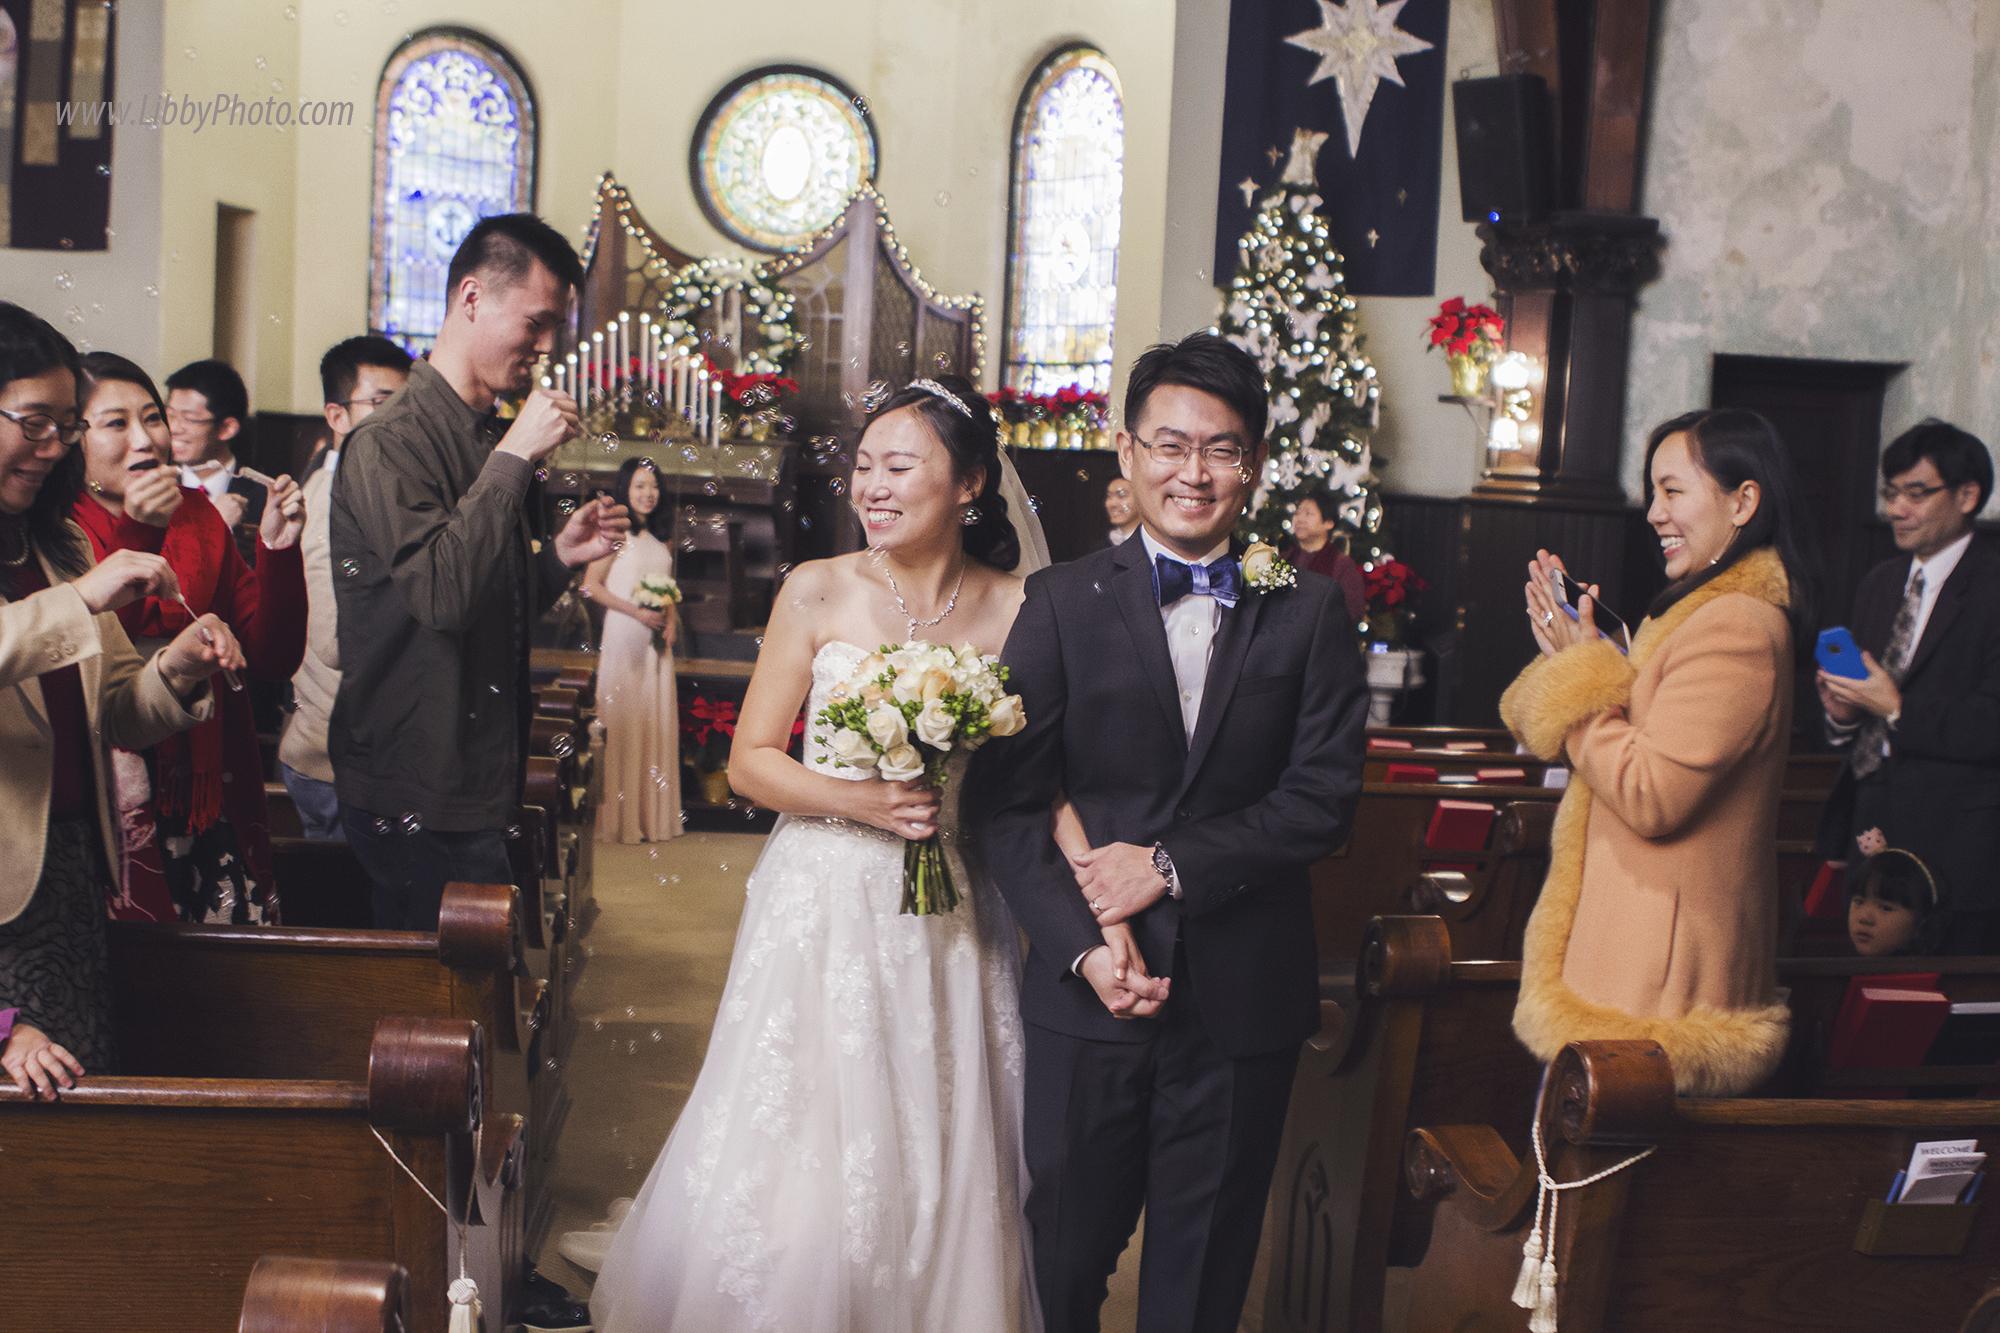 Atlanta wedding photography Libbyphoto (26).jpg